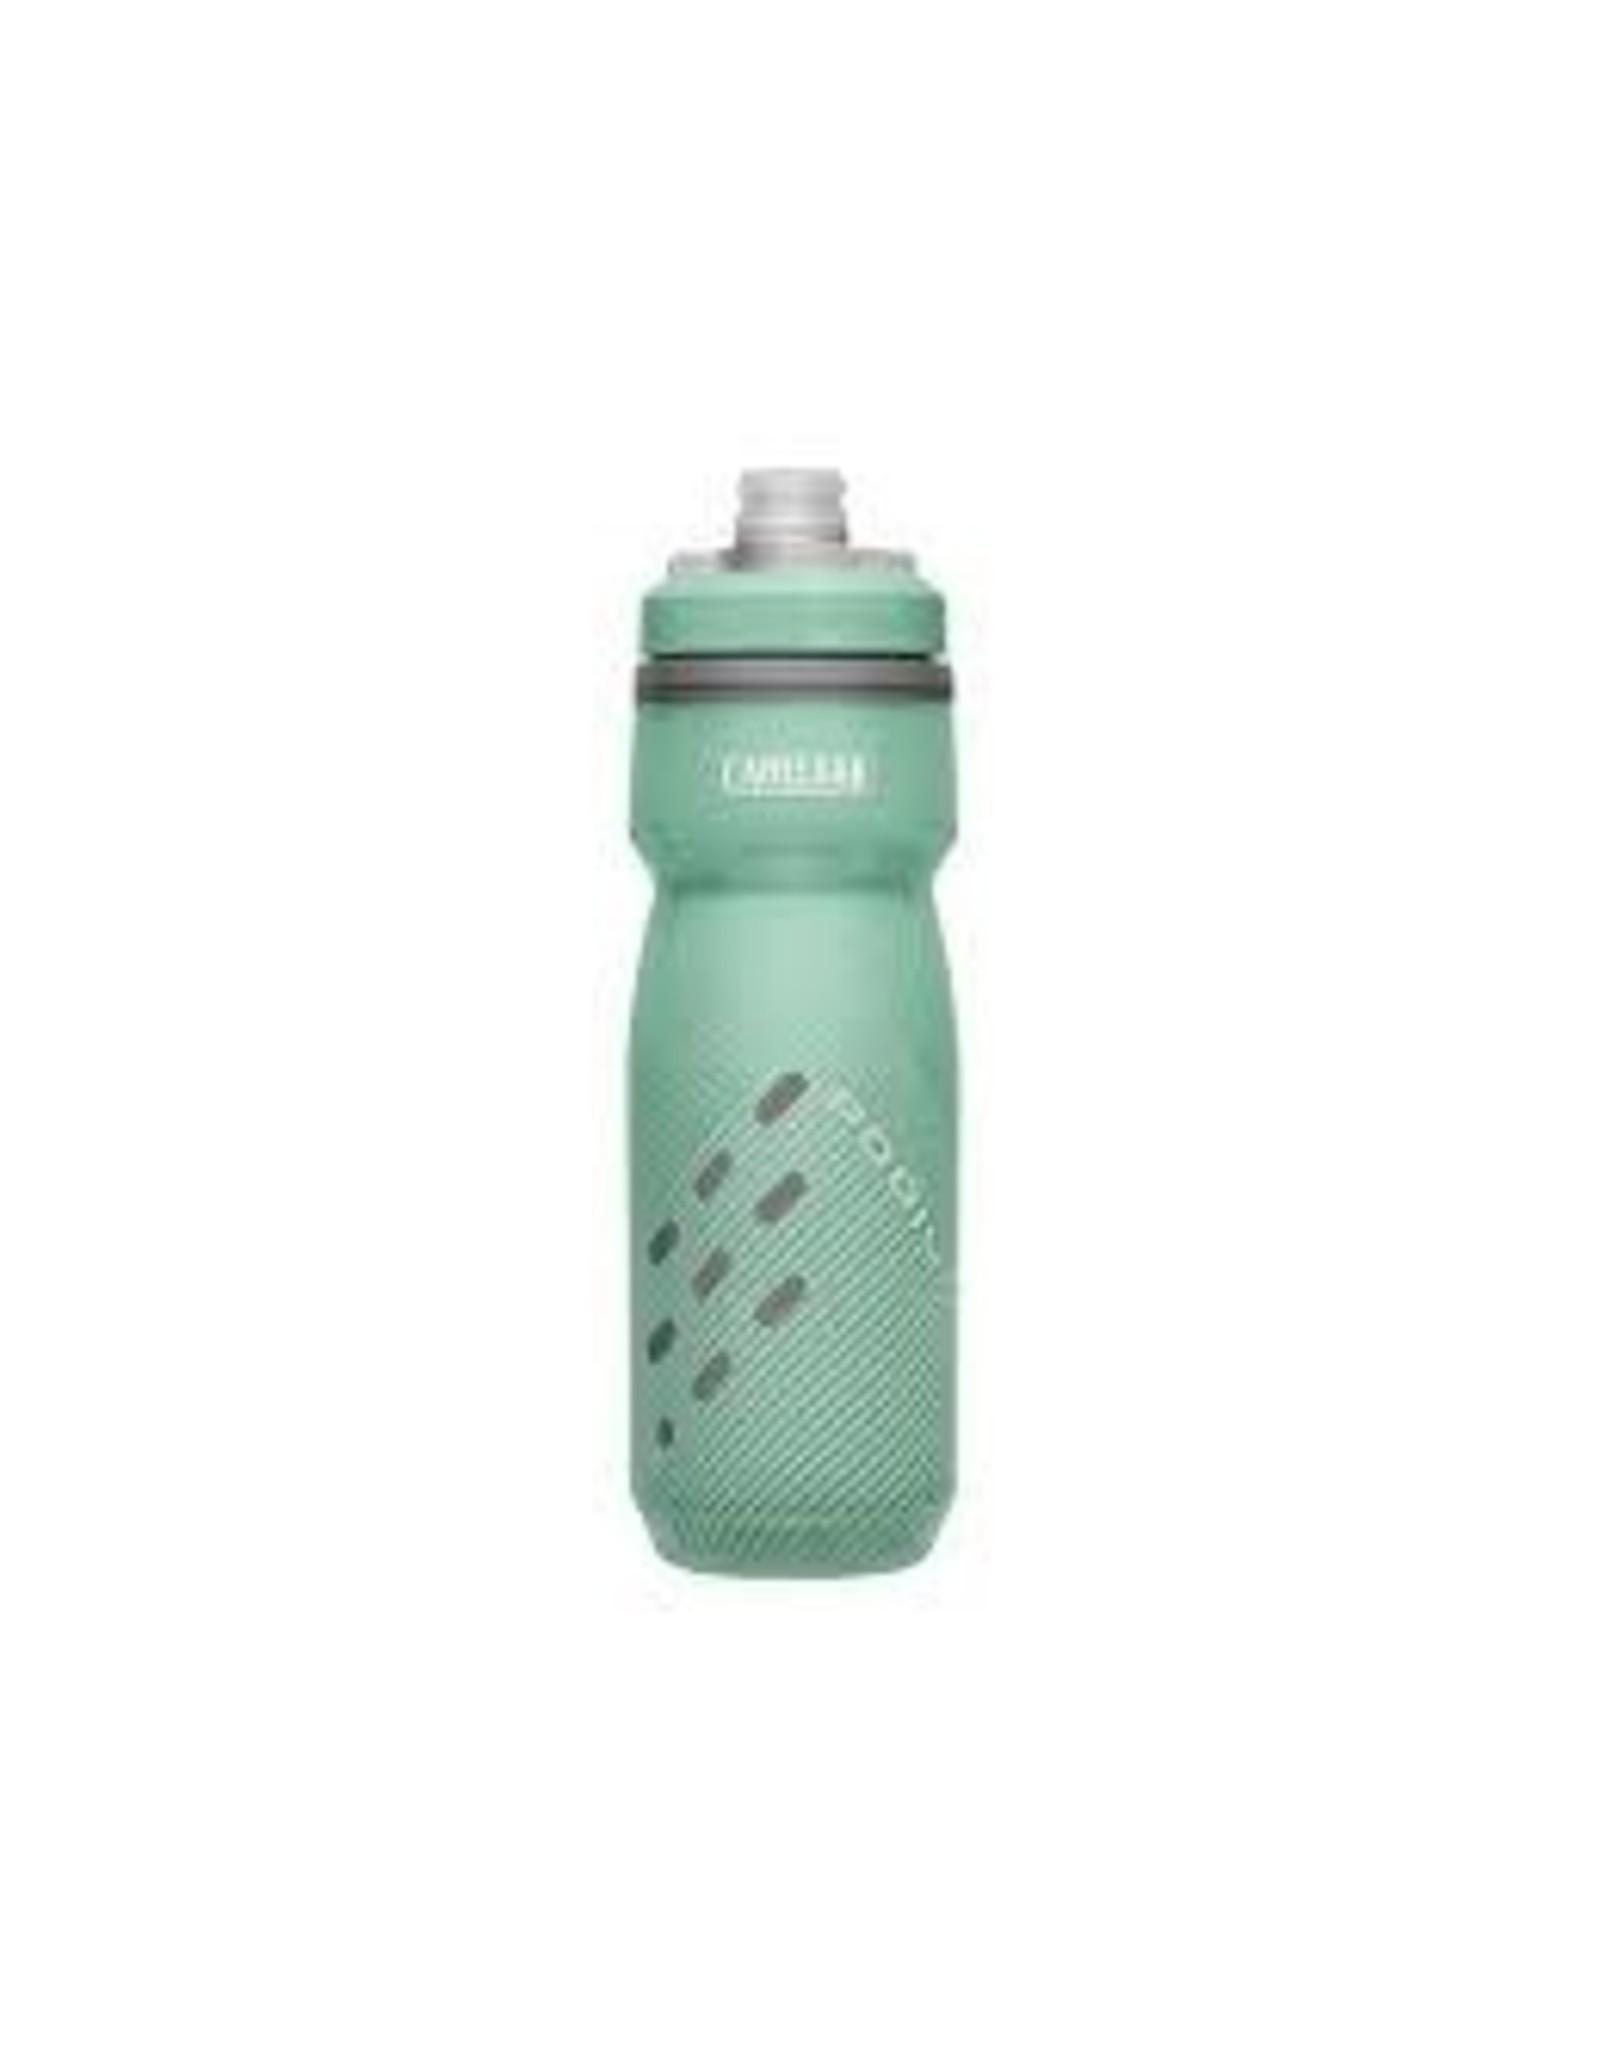 Bottle Camelbak Podium Chill 24oz Sage Perforated